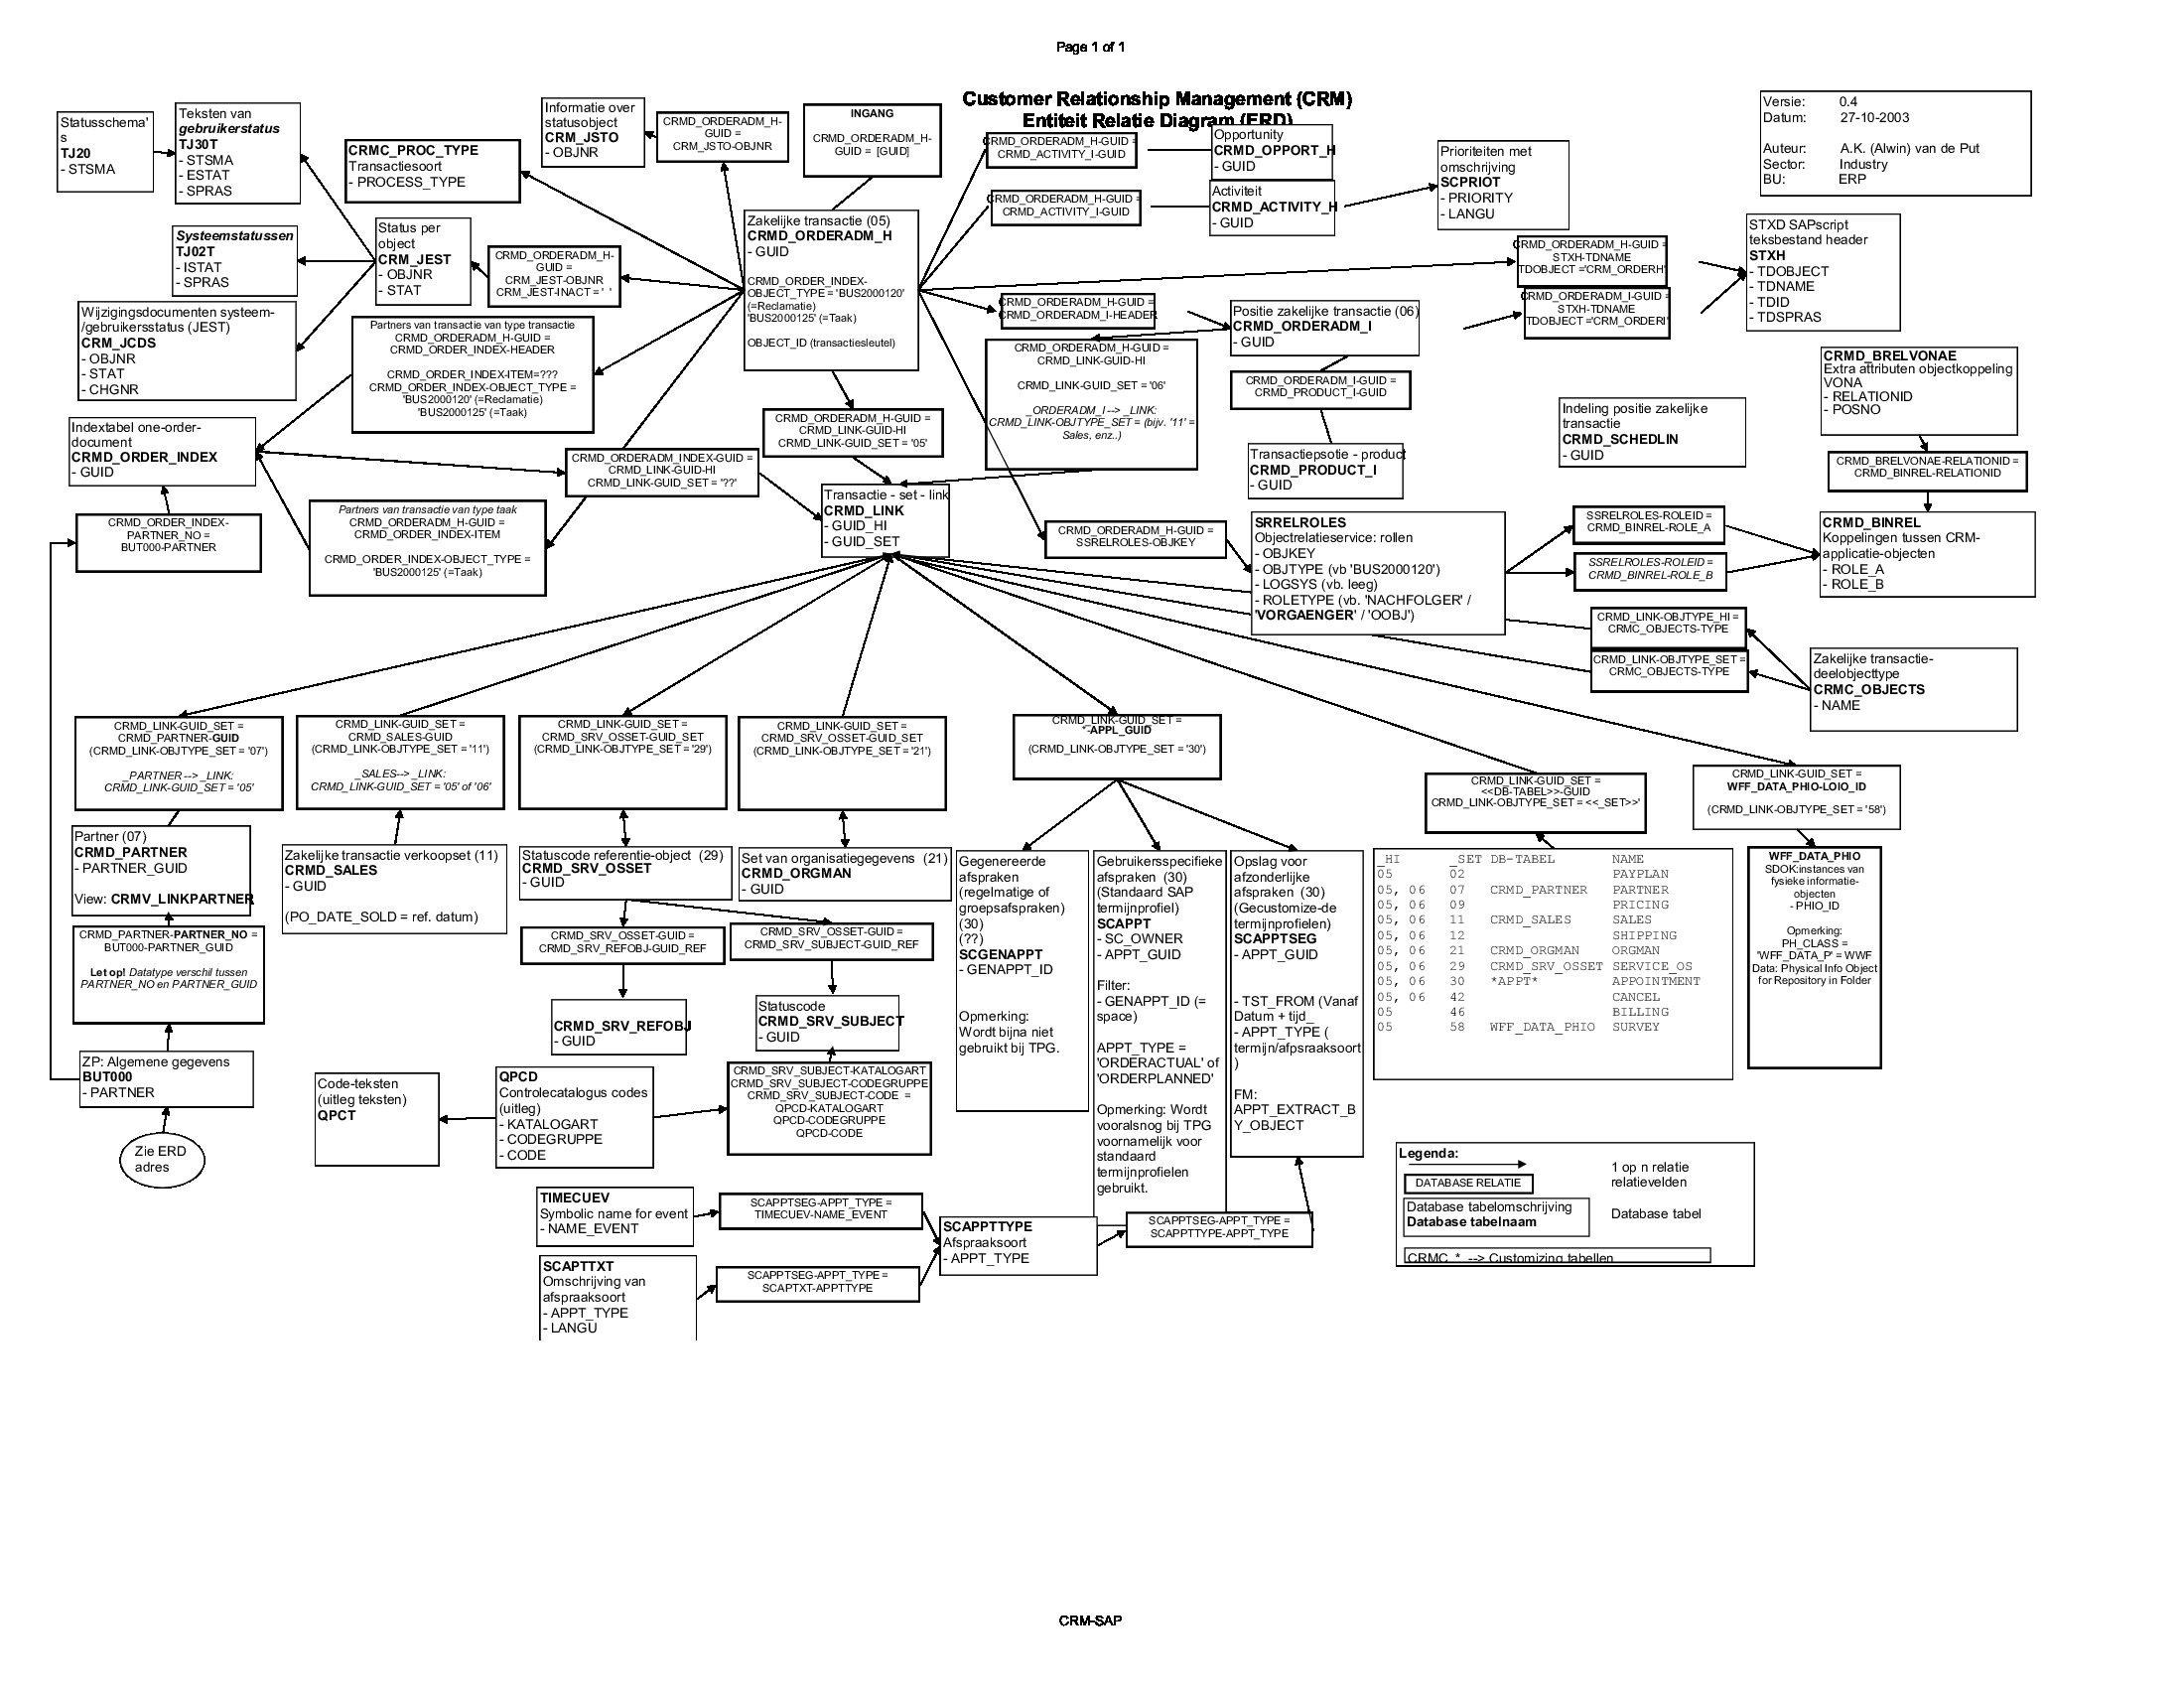 Sap Crm Erd Diagram | Sap Blogs pertaining to Examples Of Er Diagram For Car Company